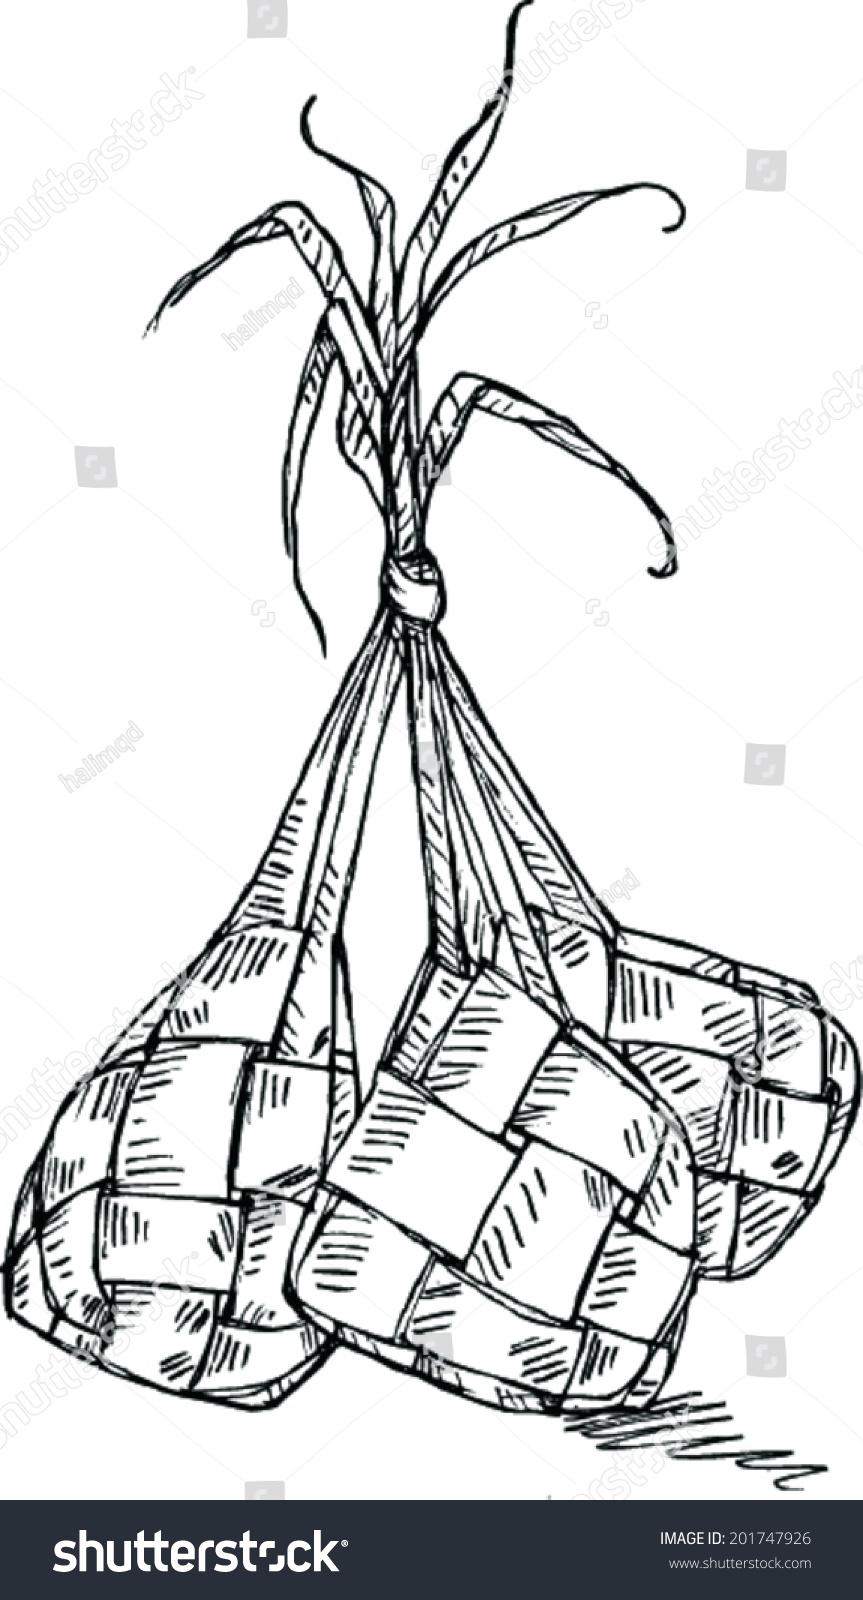 Gambar Ketupat Hitam Putih : gambar, ketupat, hitam, putih, Sketch, Ketupat, Stock, Vector, (Royalty, Free), 201747926